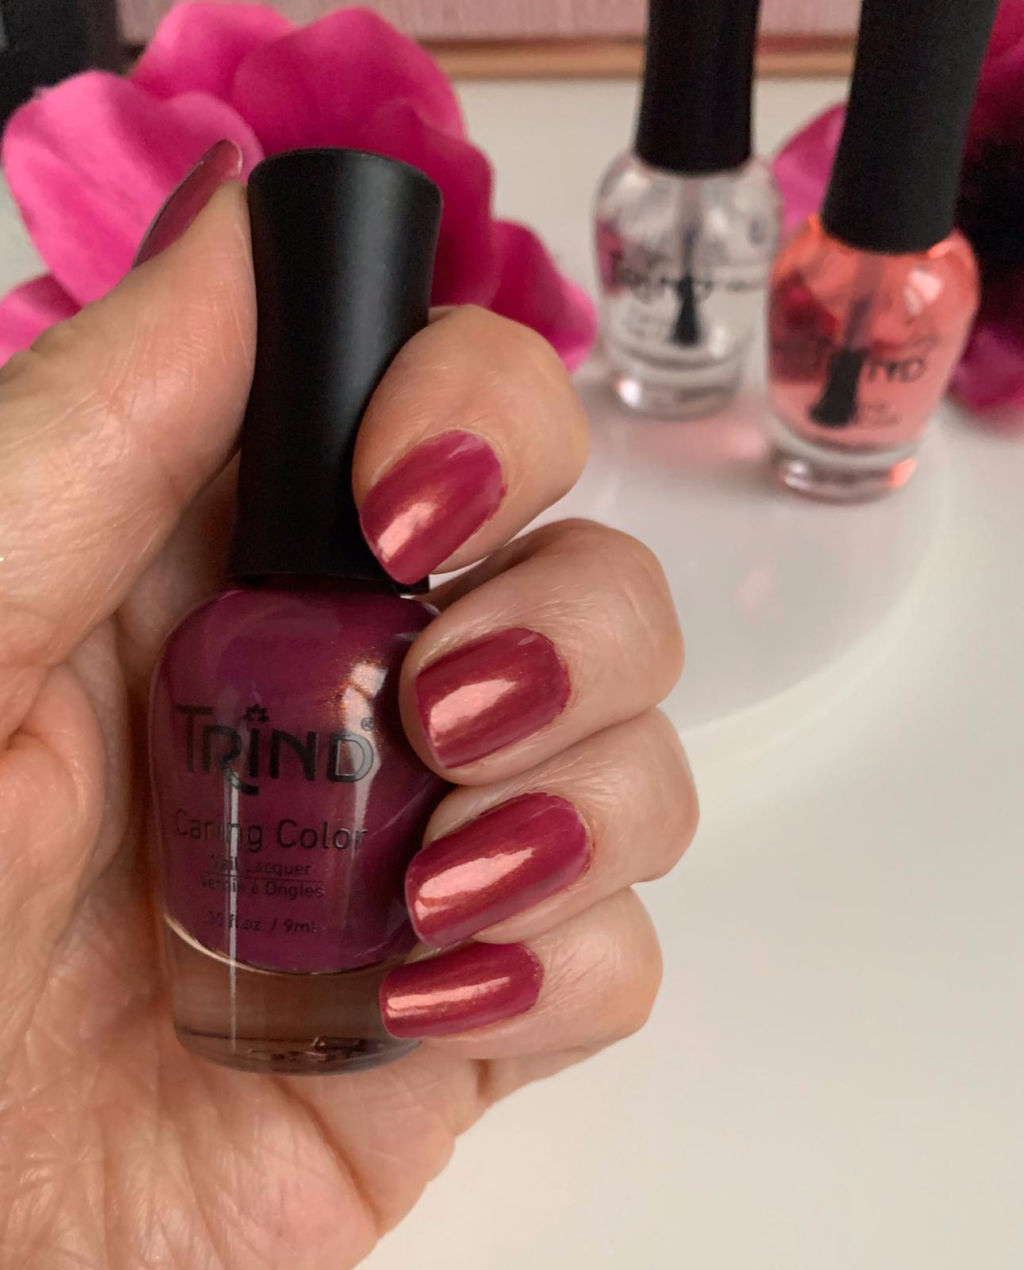 Trind nagellak Purple Zinnia review